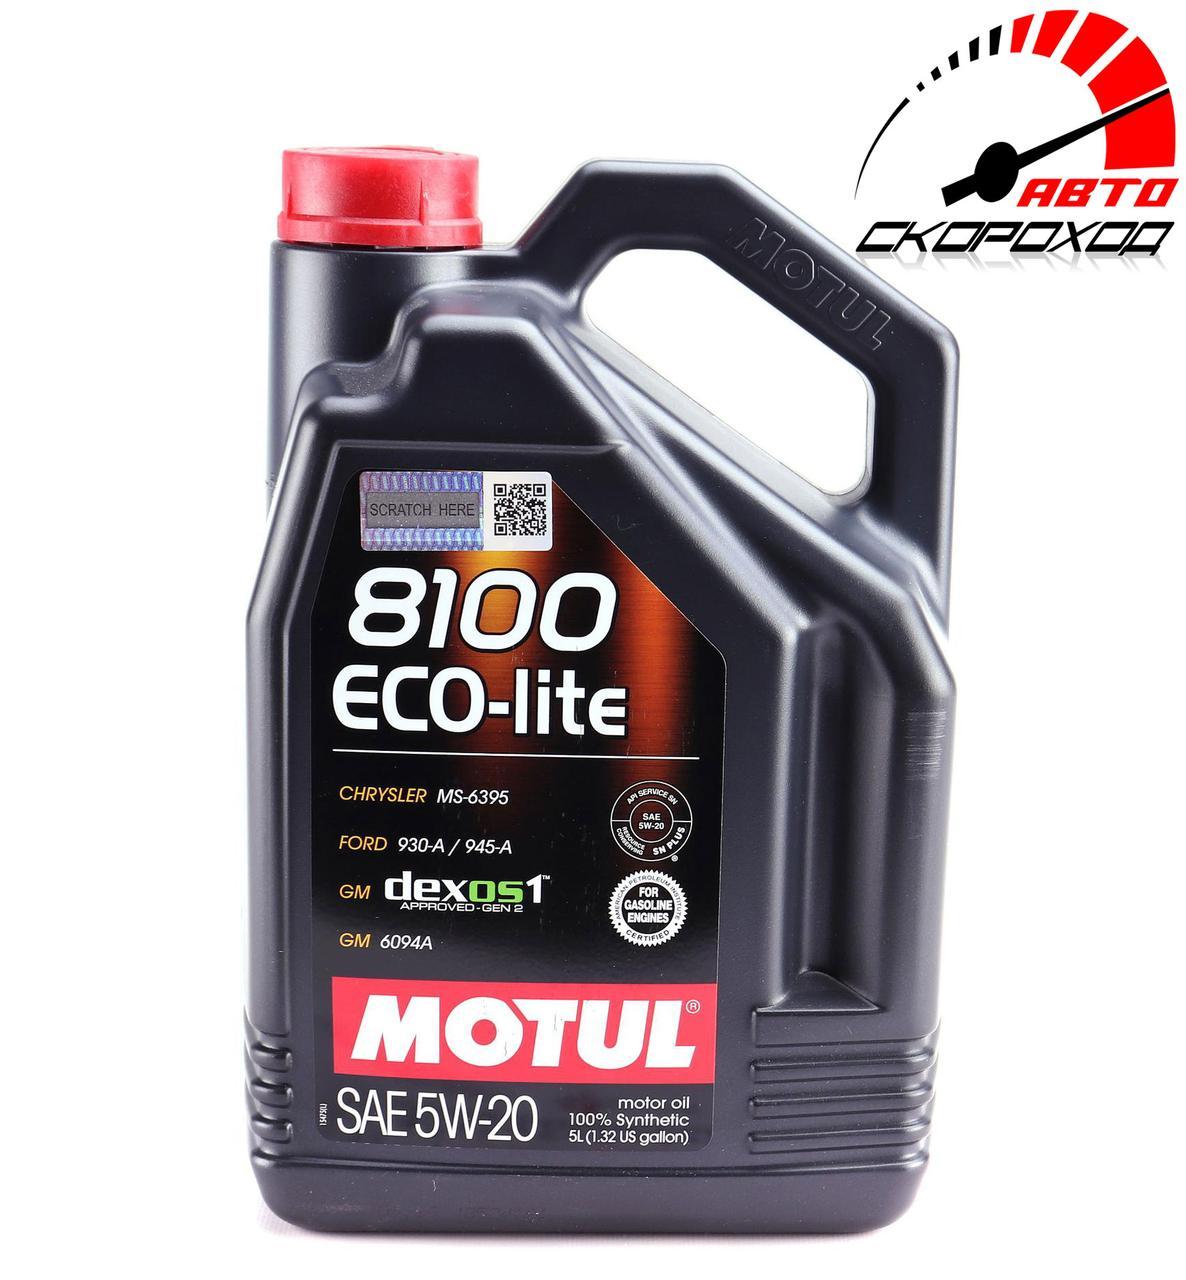 Моторное масло MOTUL 8100 ECO-LITE 5W20 (5л) API SN Plus, ILSAC GF-5